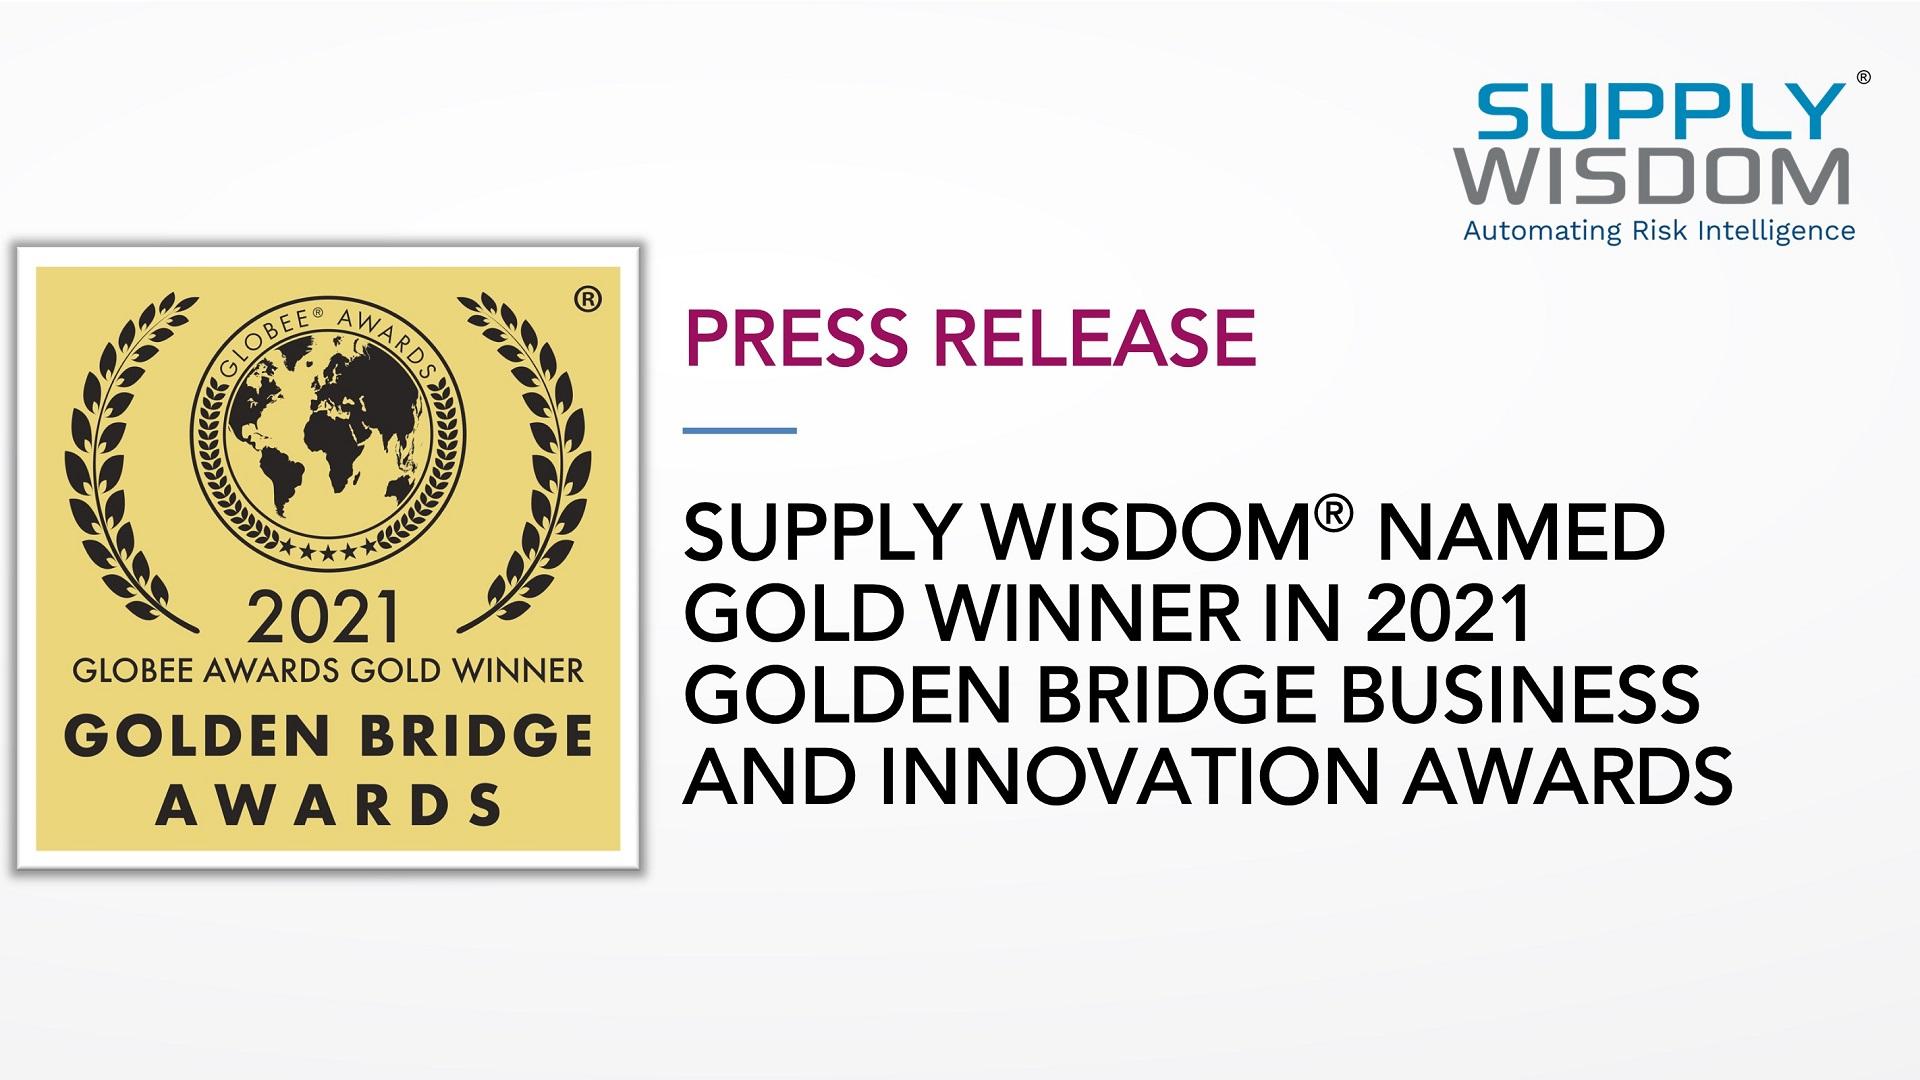 Supply Wisdom Wins Golden Bridge Globee Award for Risk Management Innovation